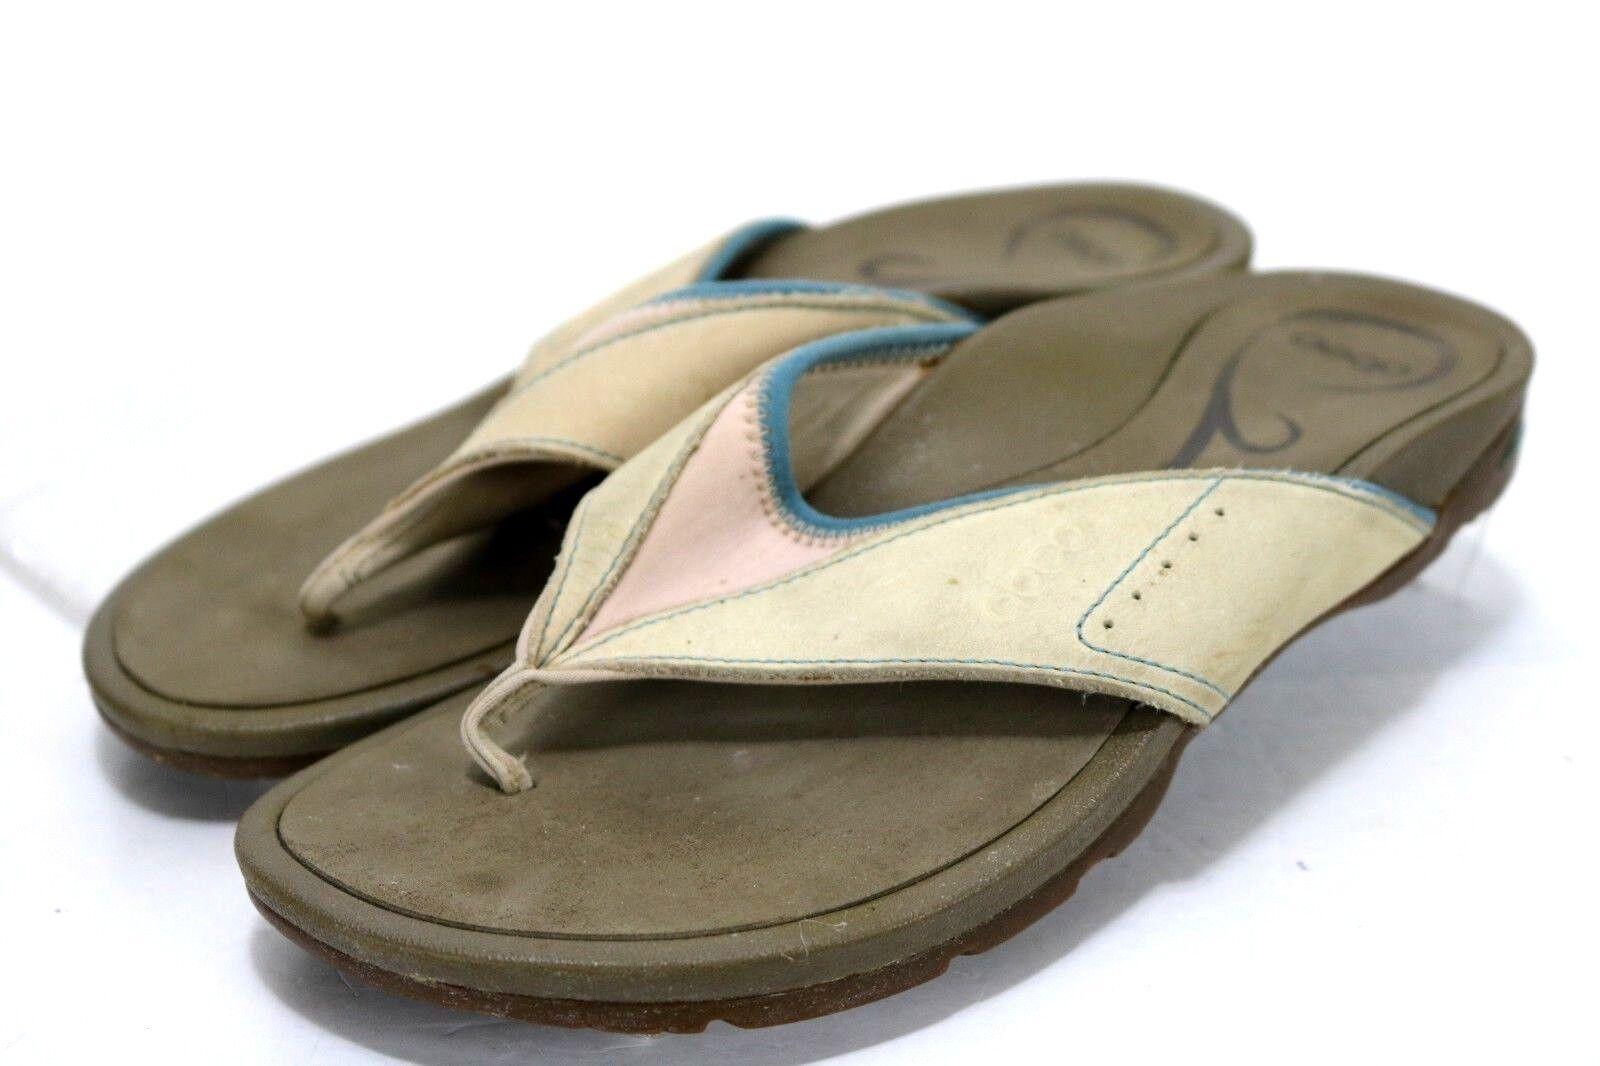 ABEO Balboa Cement  89 Women's Slip-On Sandals Size 8 Tan bluee